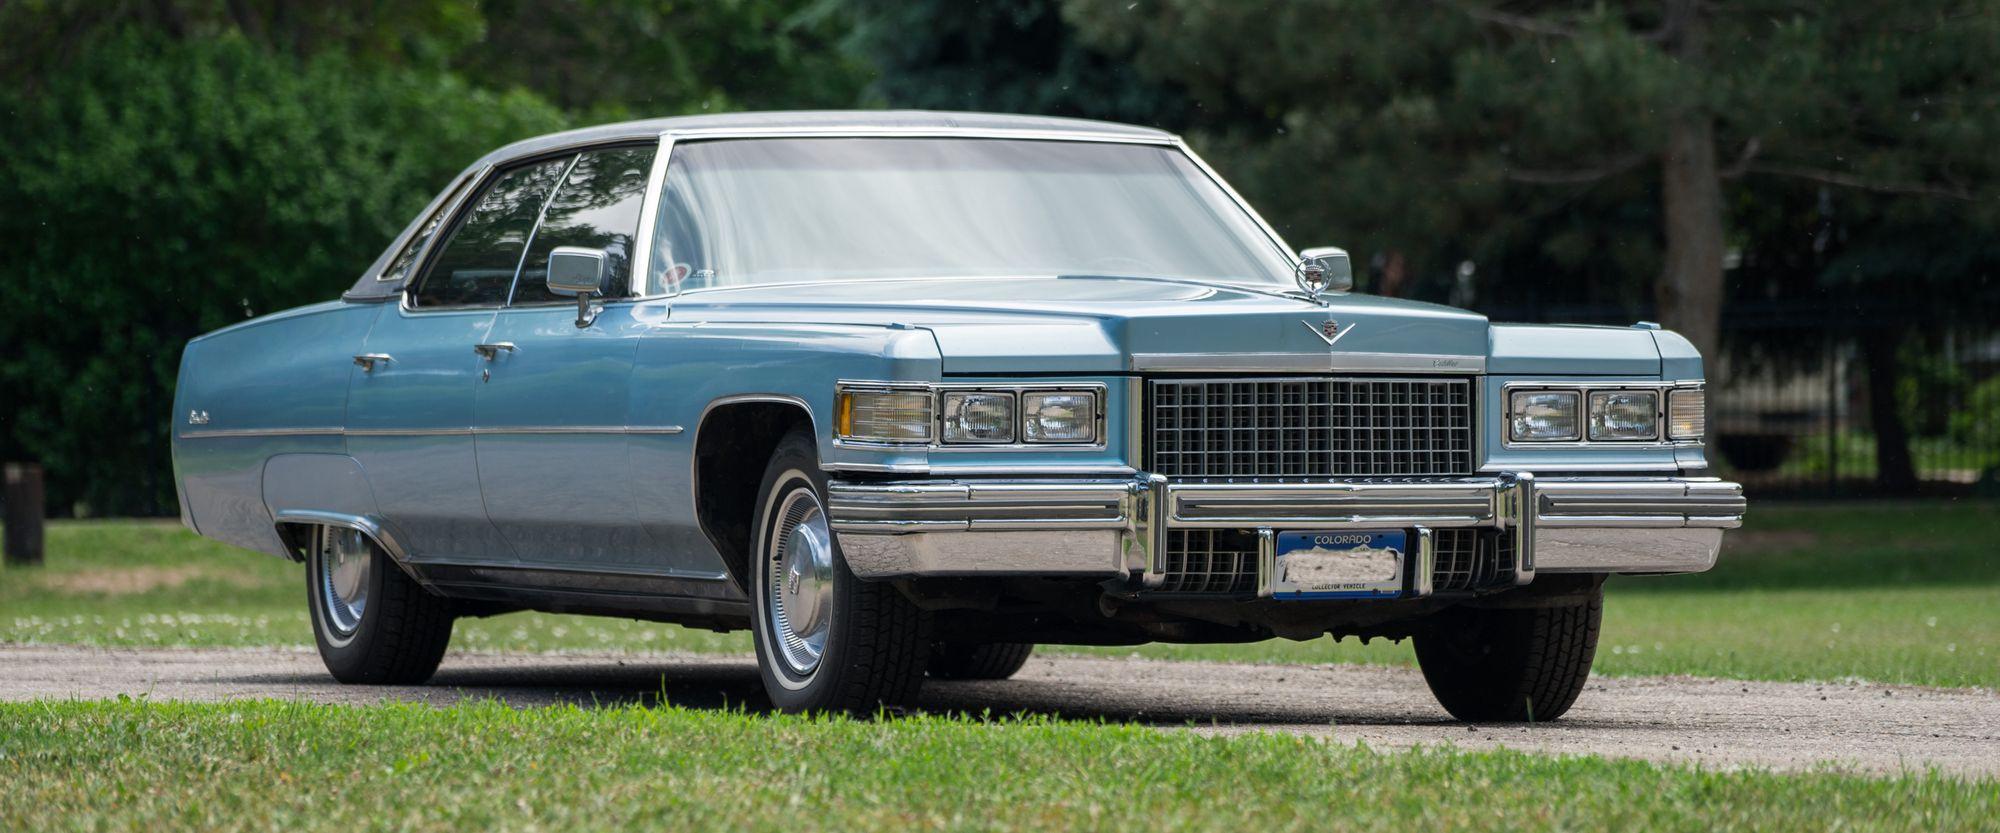 "<img src=""1976-cadillac.jpg"" alt=""A 1976 Cadillac Sedan de Ville"">"